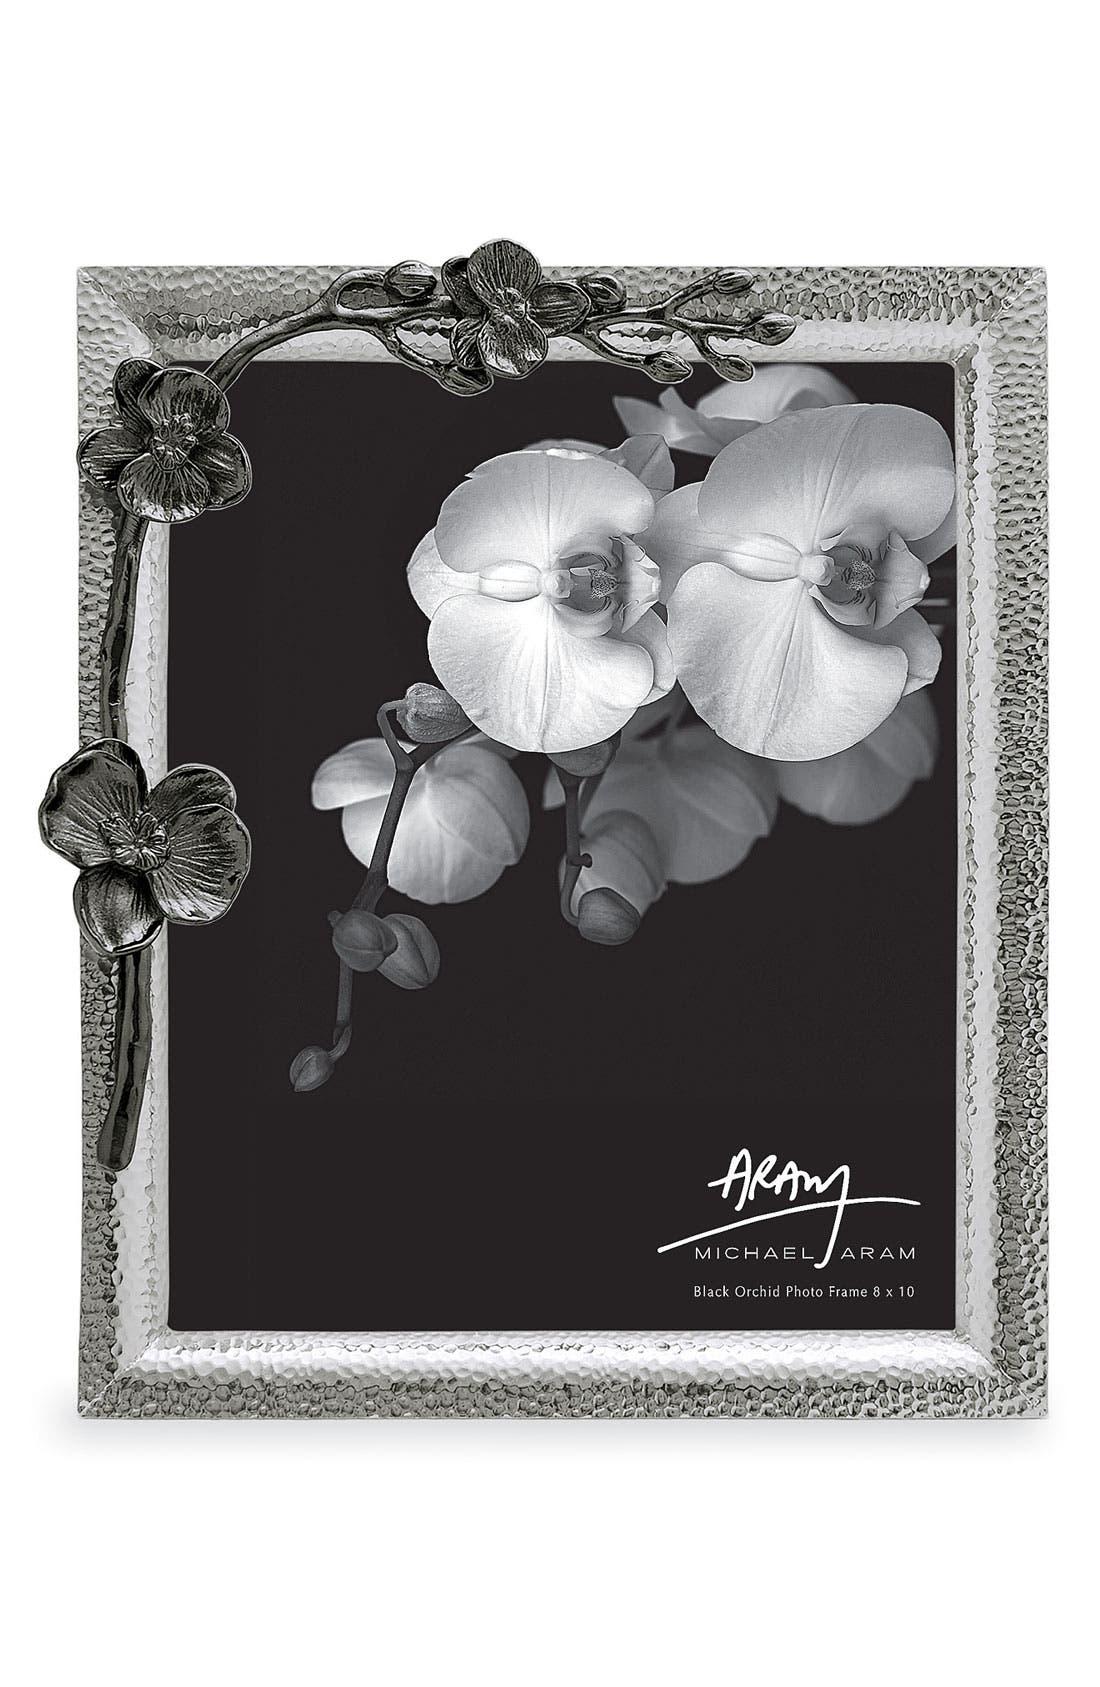 e888b089e30d Frames Michael Aram Home Decor   Gifts